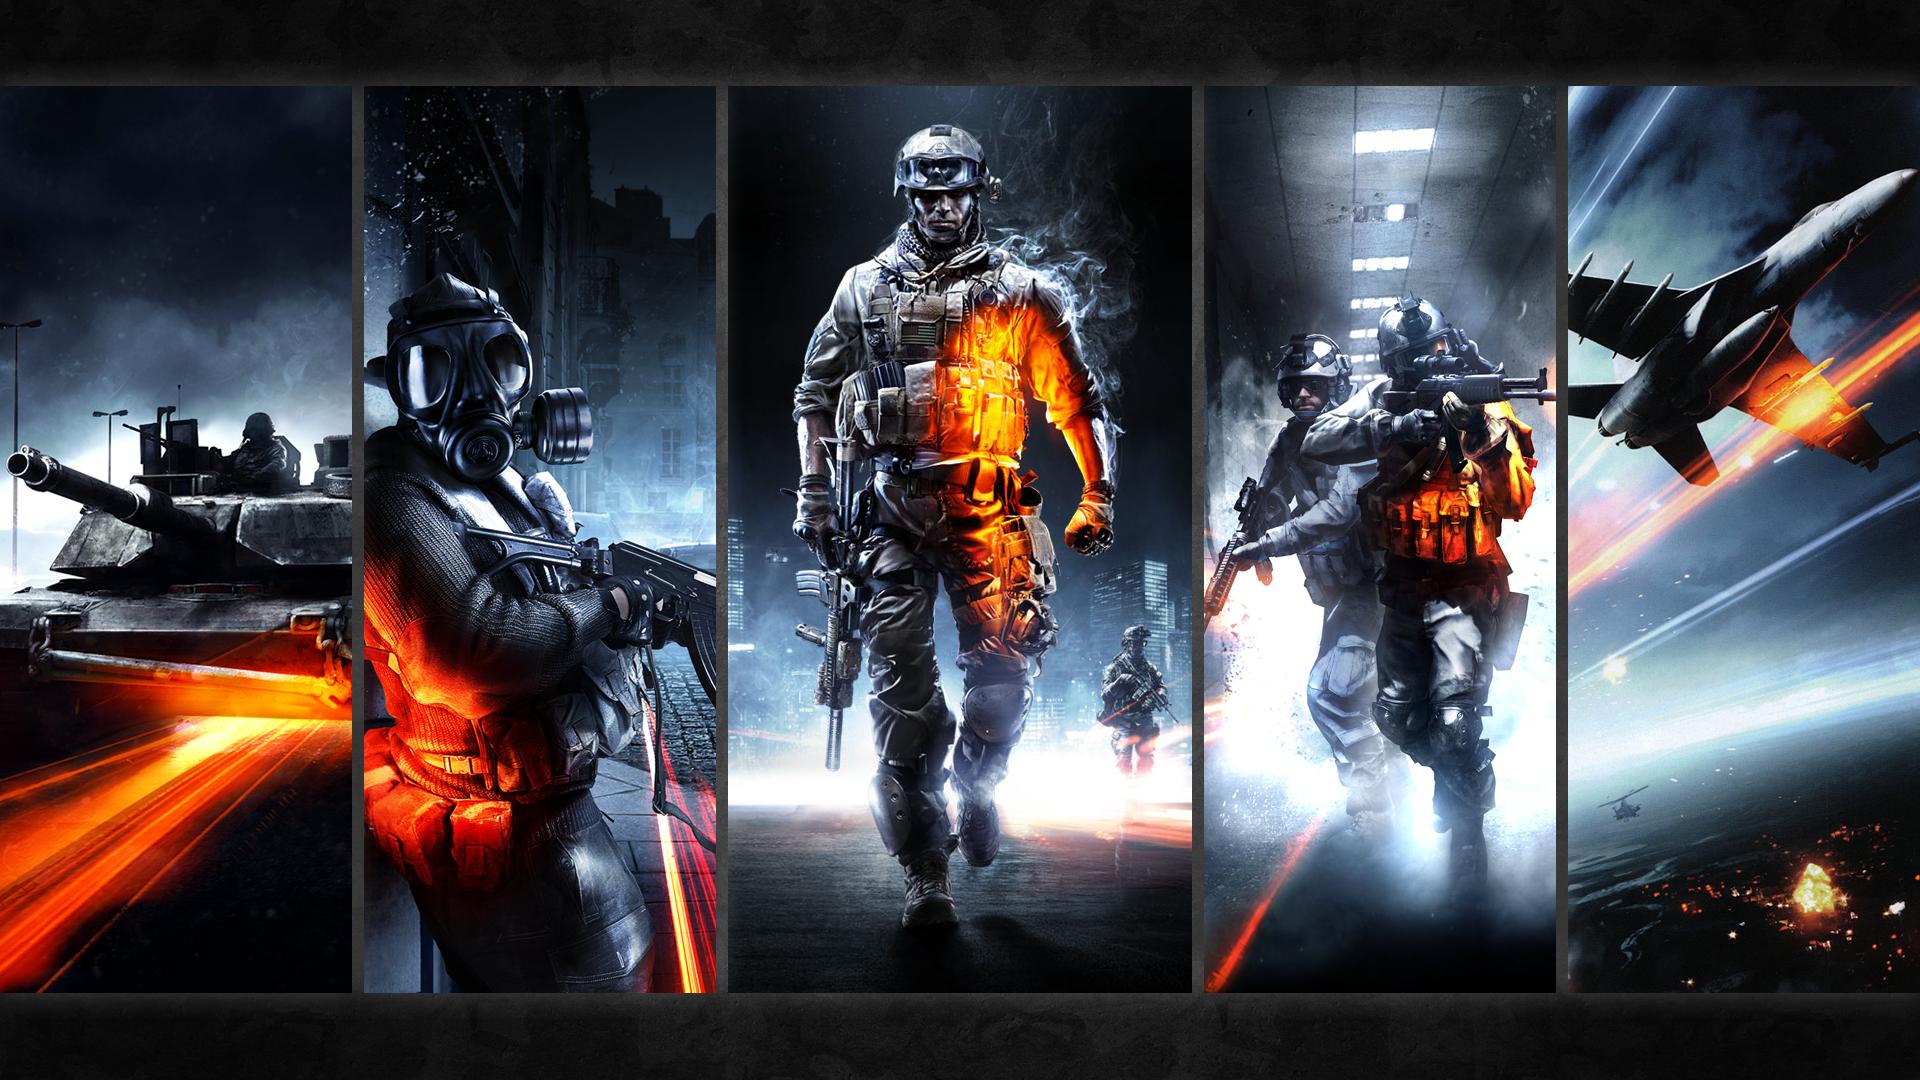 Battlefield 4 Animated Wallpapers Wallpapersafari